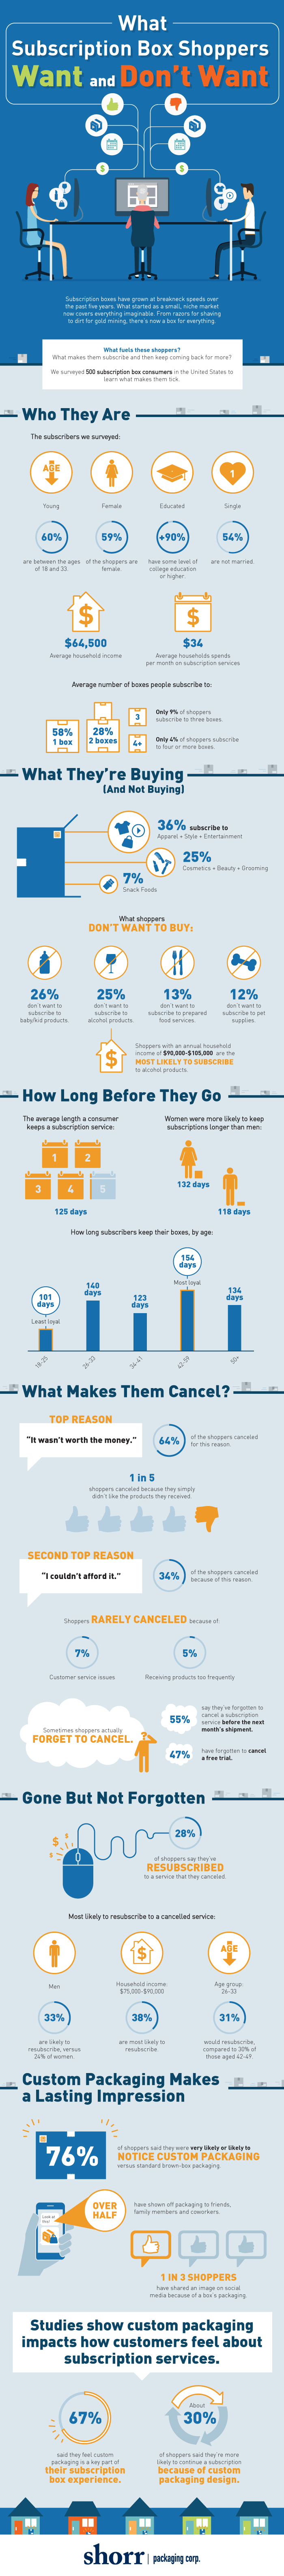 The Likes & Dislikes of Subscription Box Shoppers